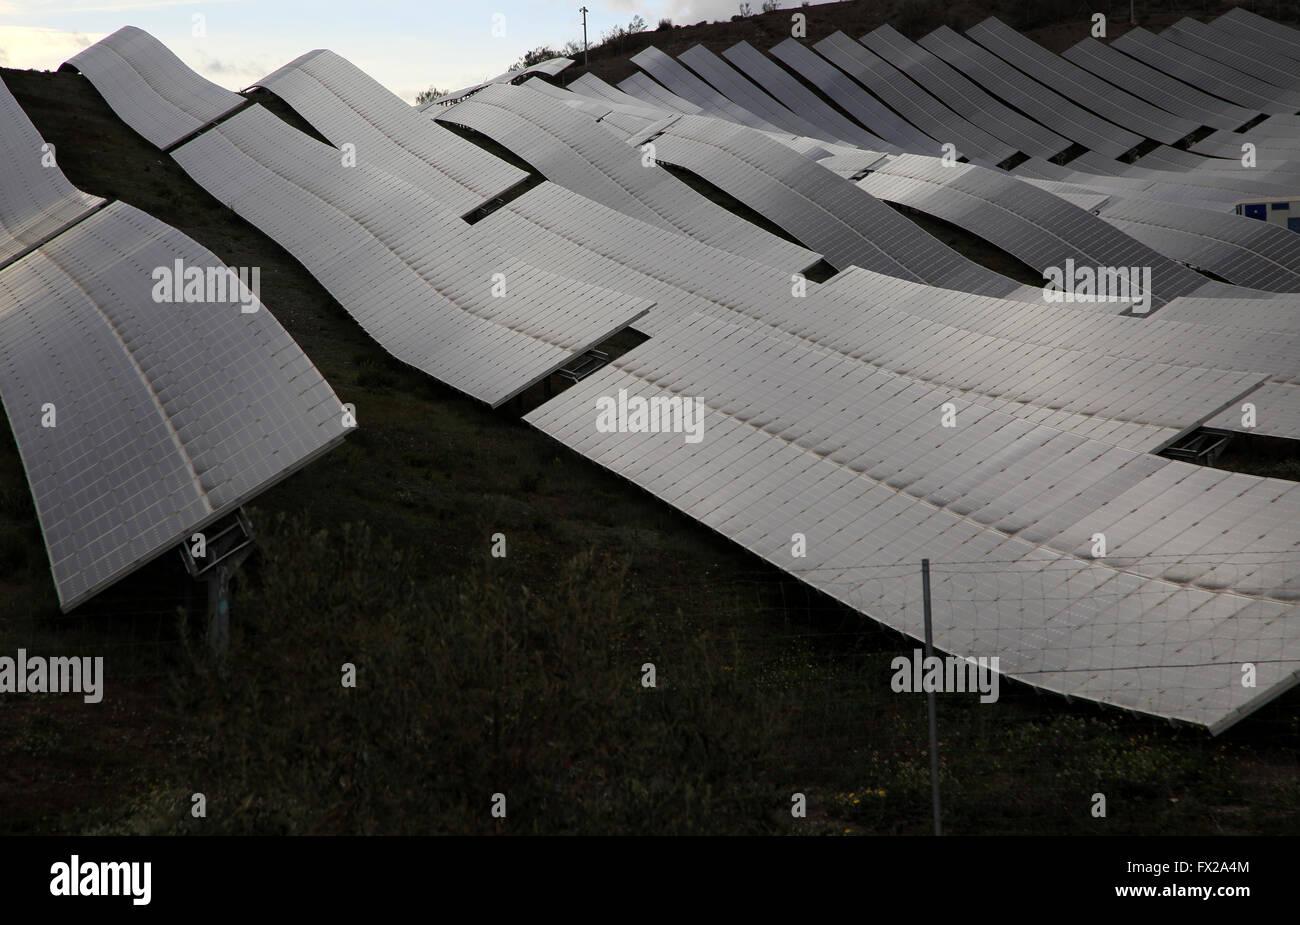 Array of solar panels on a  grey overcast day, Sierra Alhamilla, near Nijar, Almeria, Spain - Stock Image